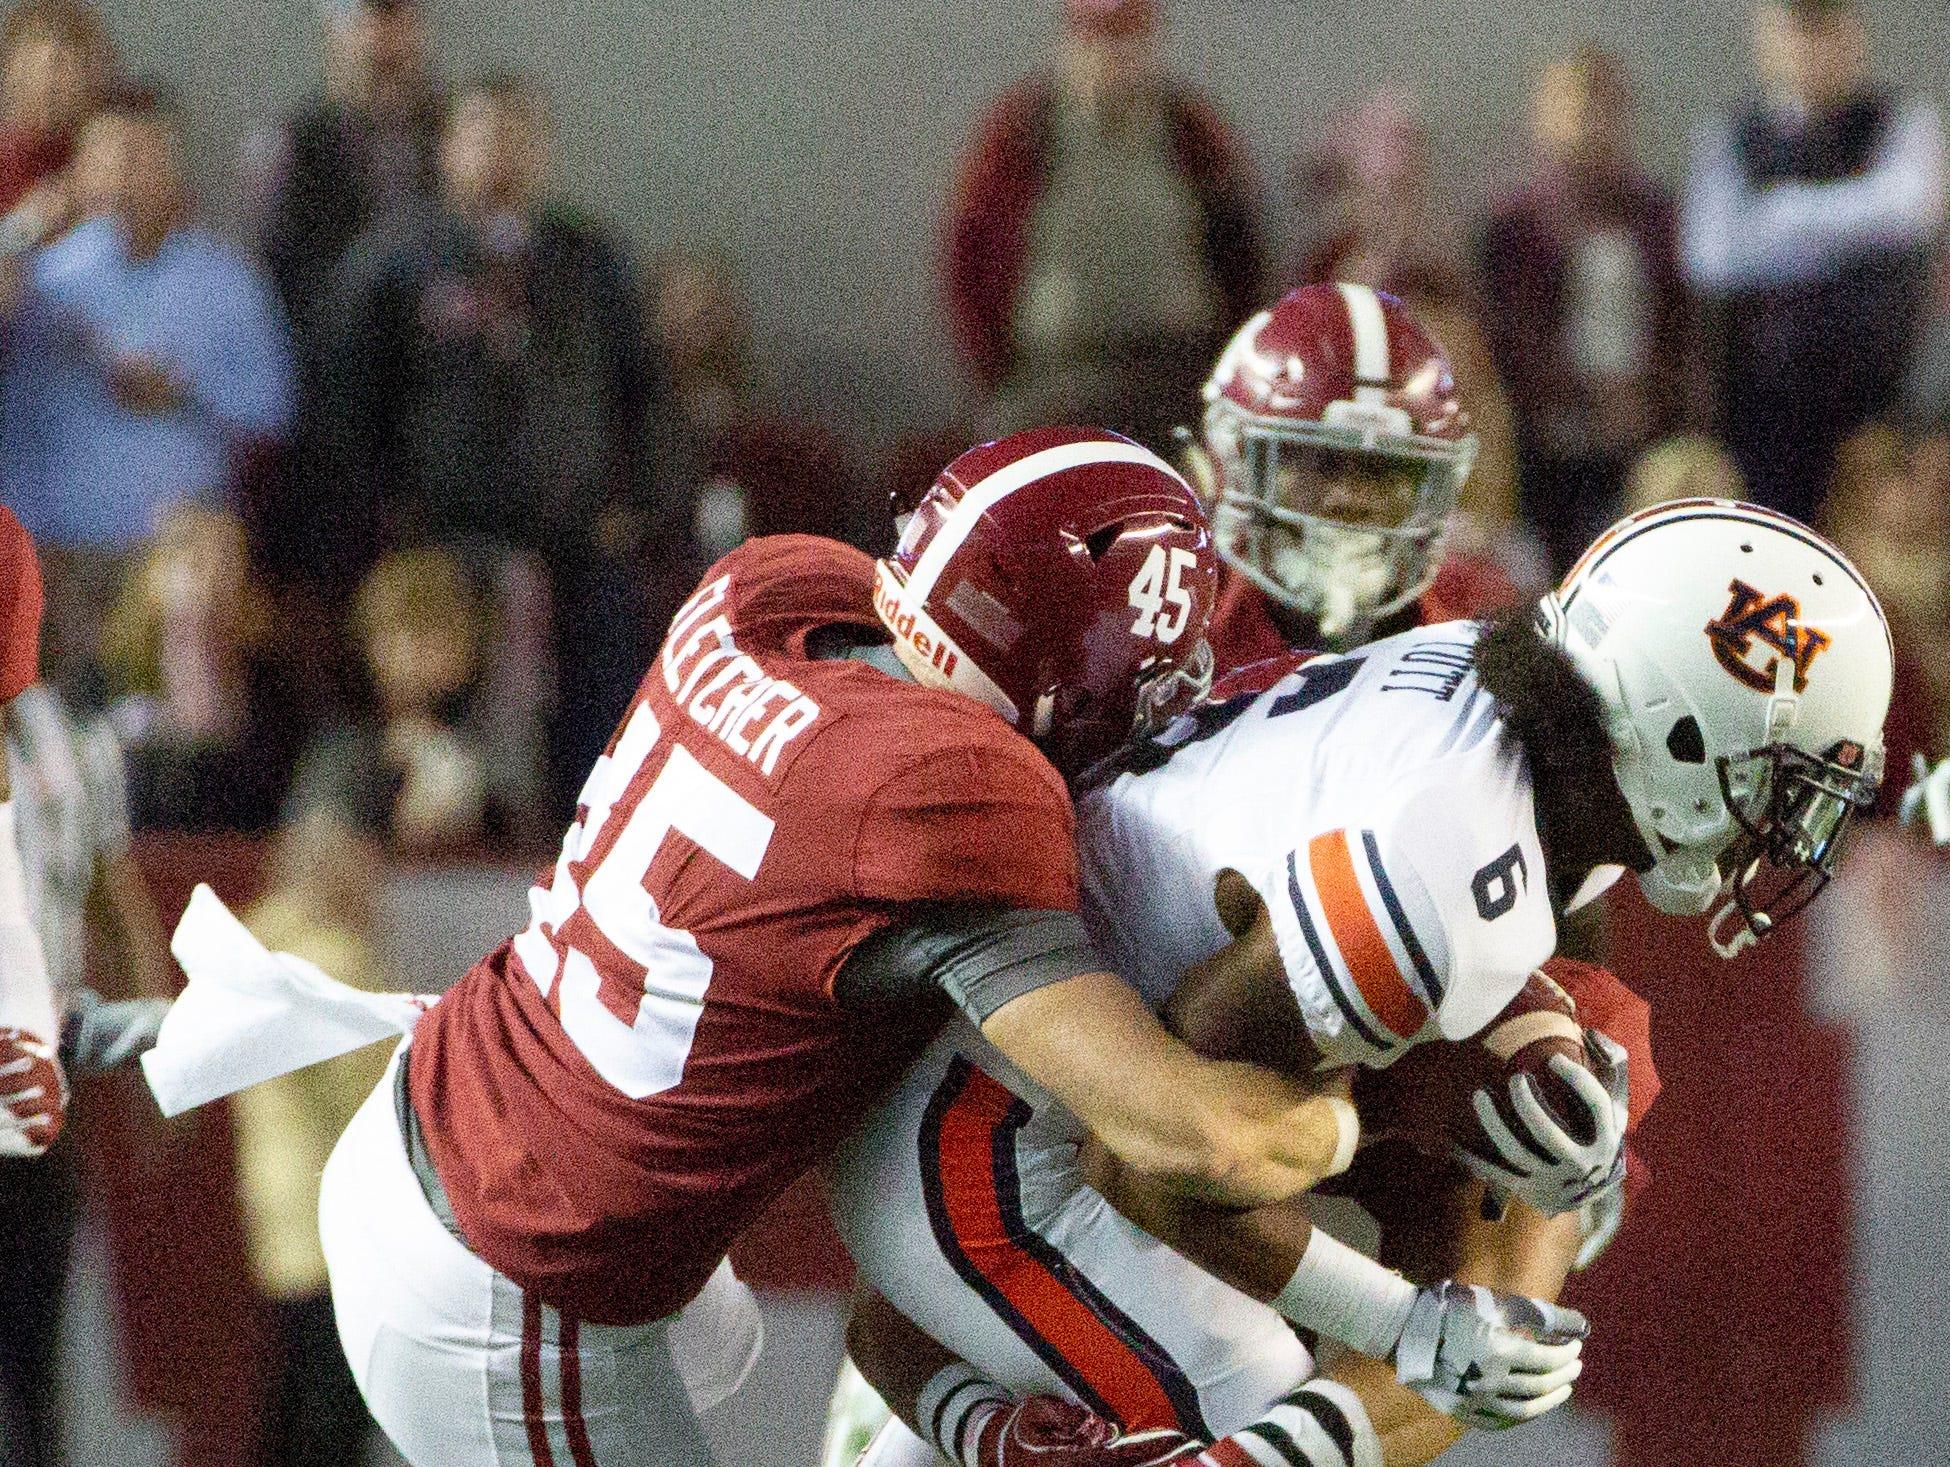 Alabama's Thomas Fletcher takes down Auburn's Christian Tutt during a play in the third quarter.